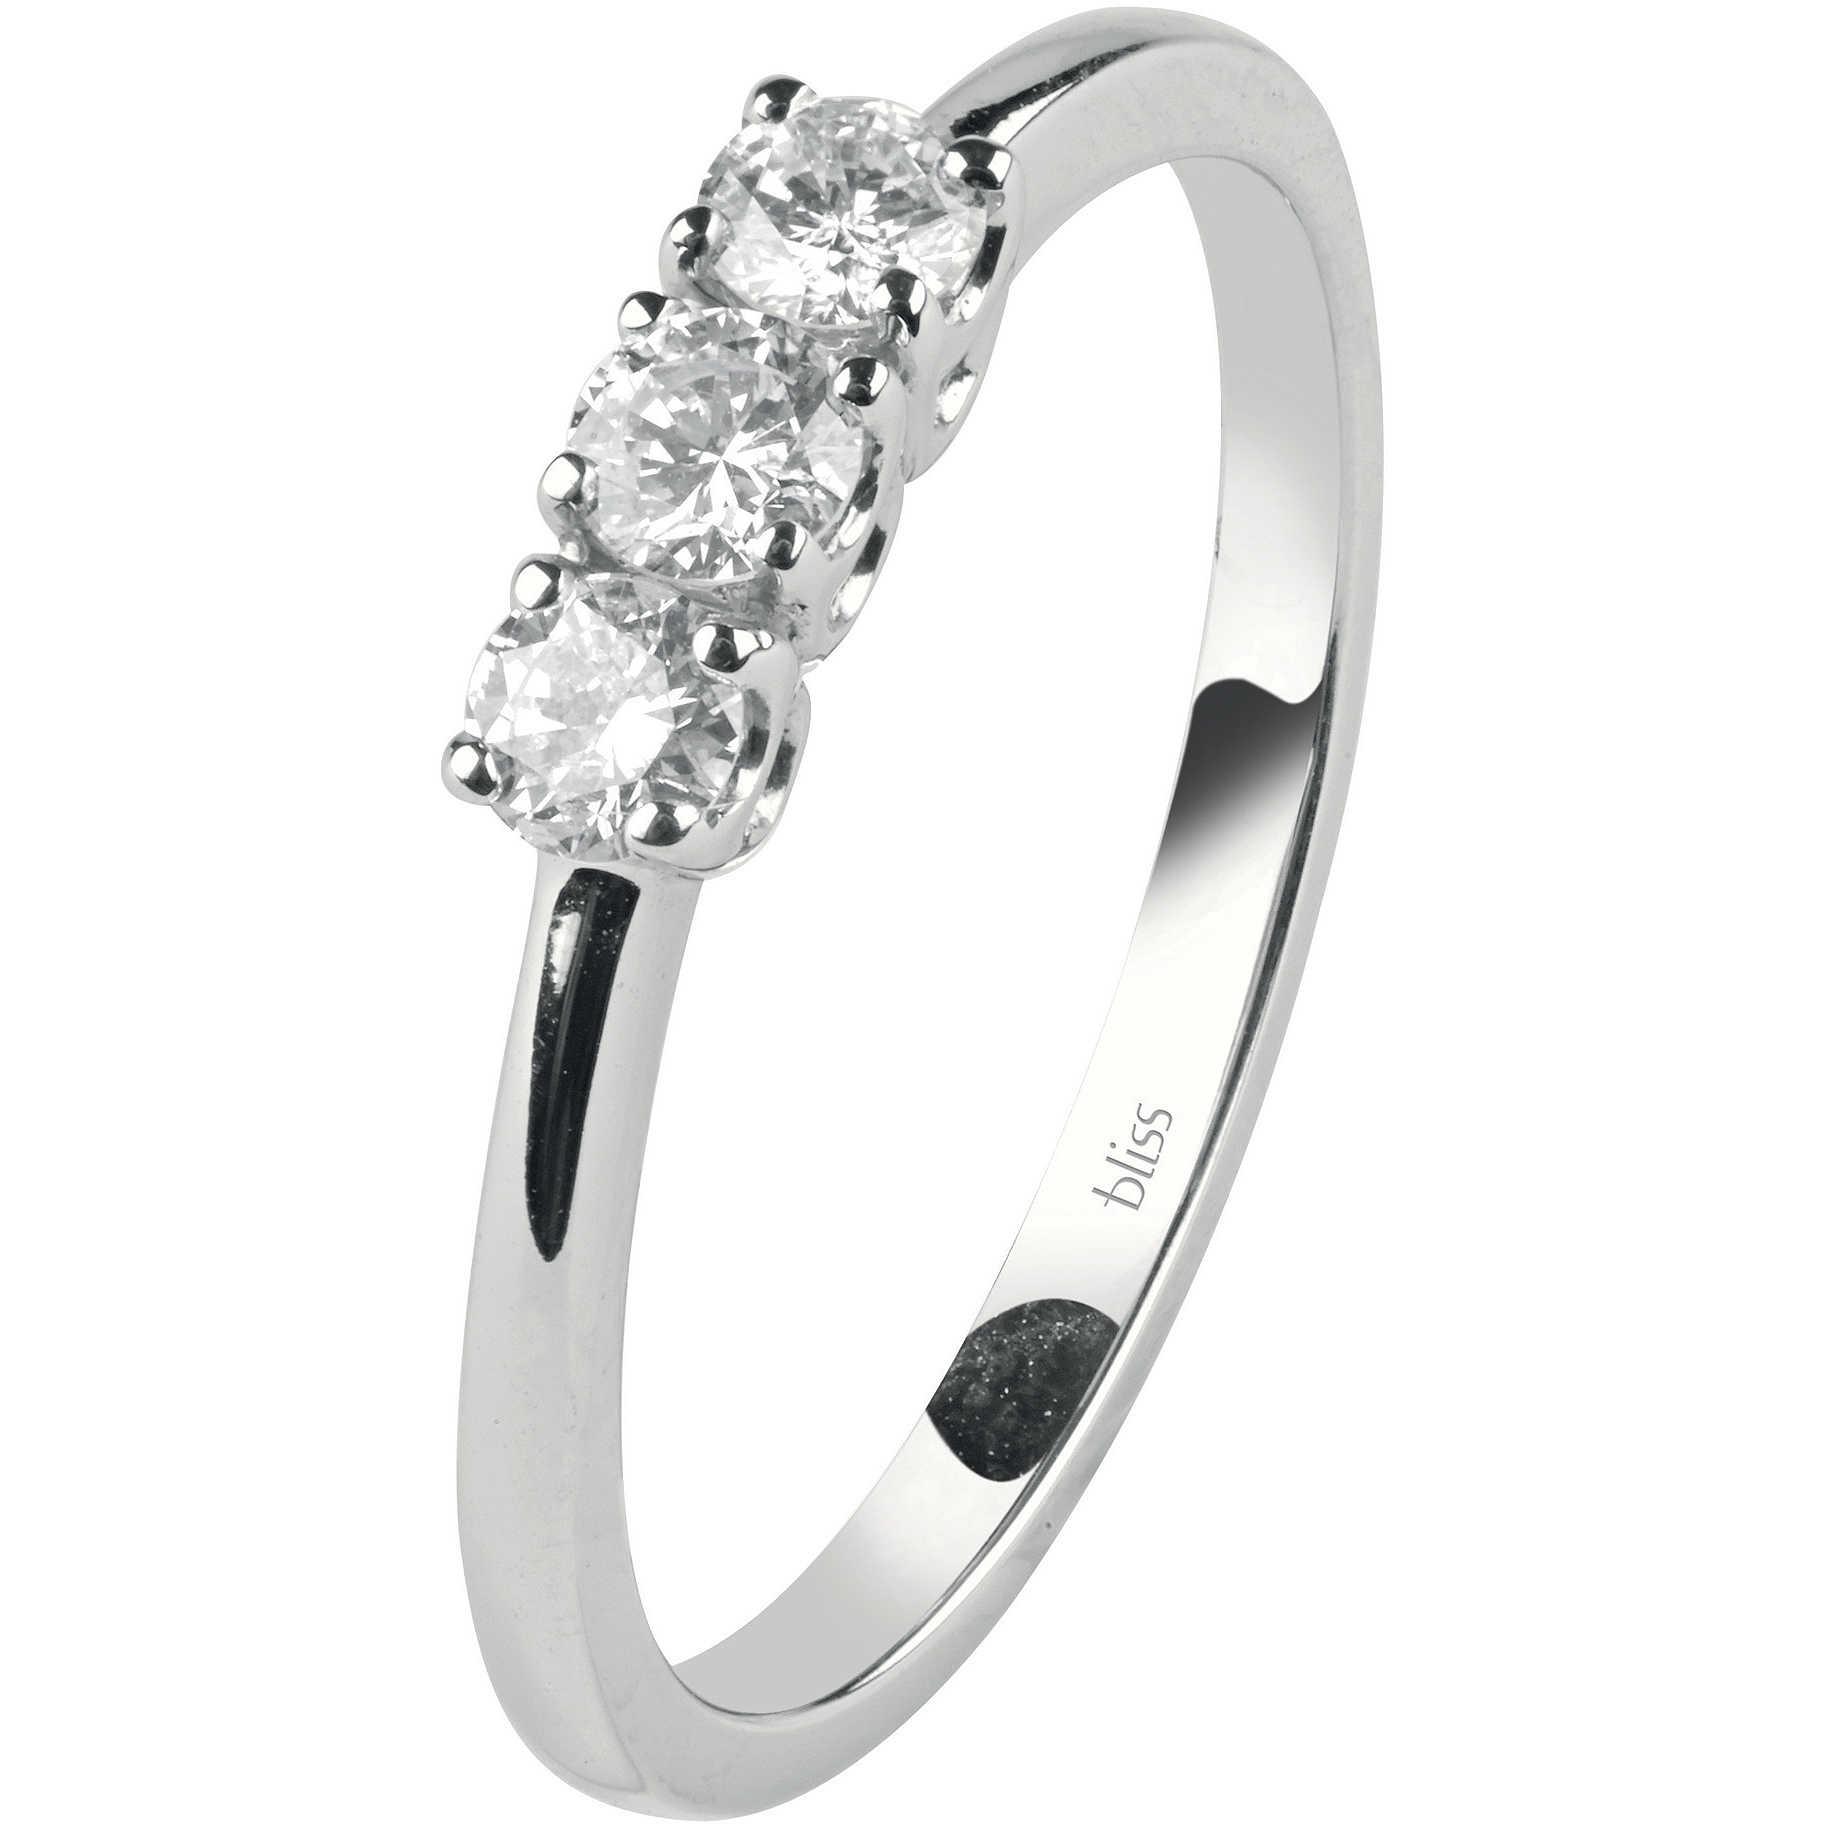 Bliss ANELLO TRILOGY oro bianco e diamanti ref. 20073217